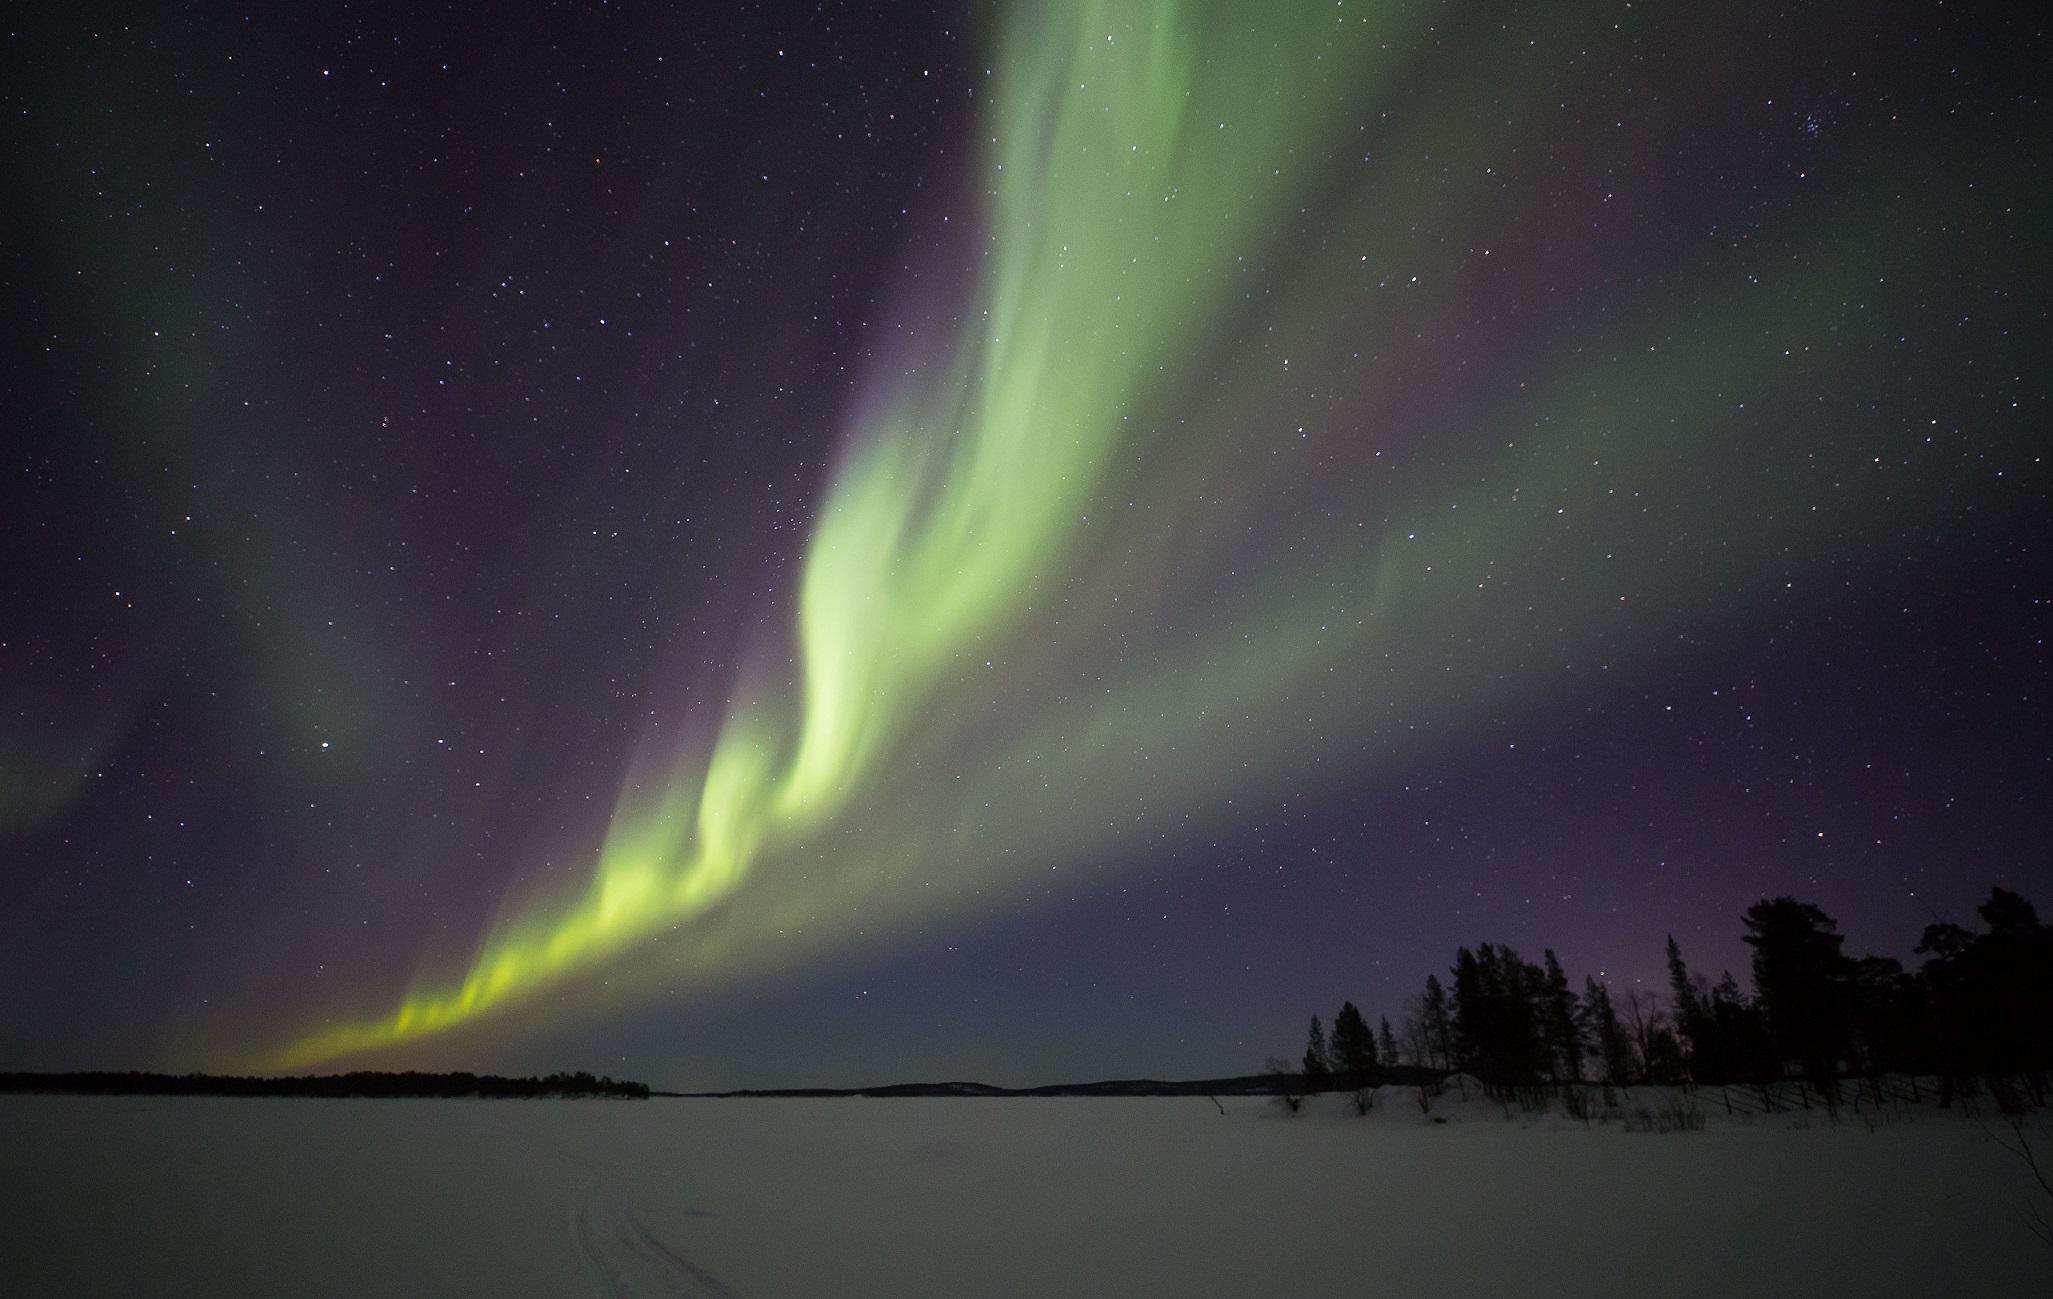 Korpikartano aurora 7.3.2019 a